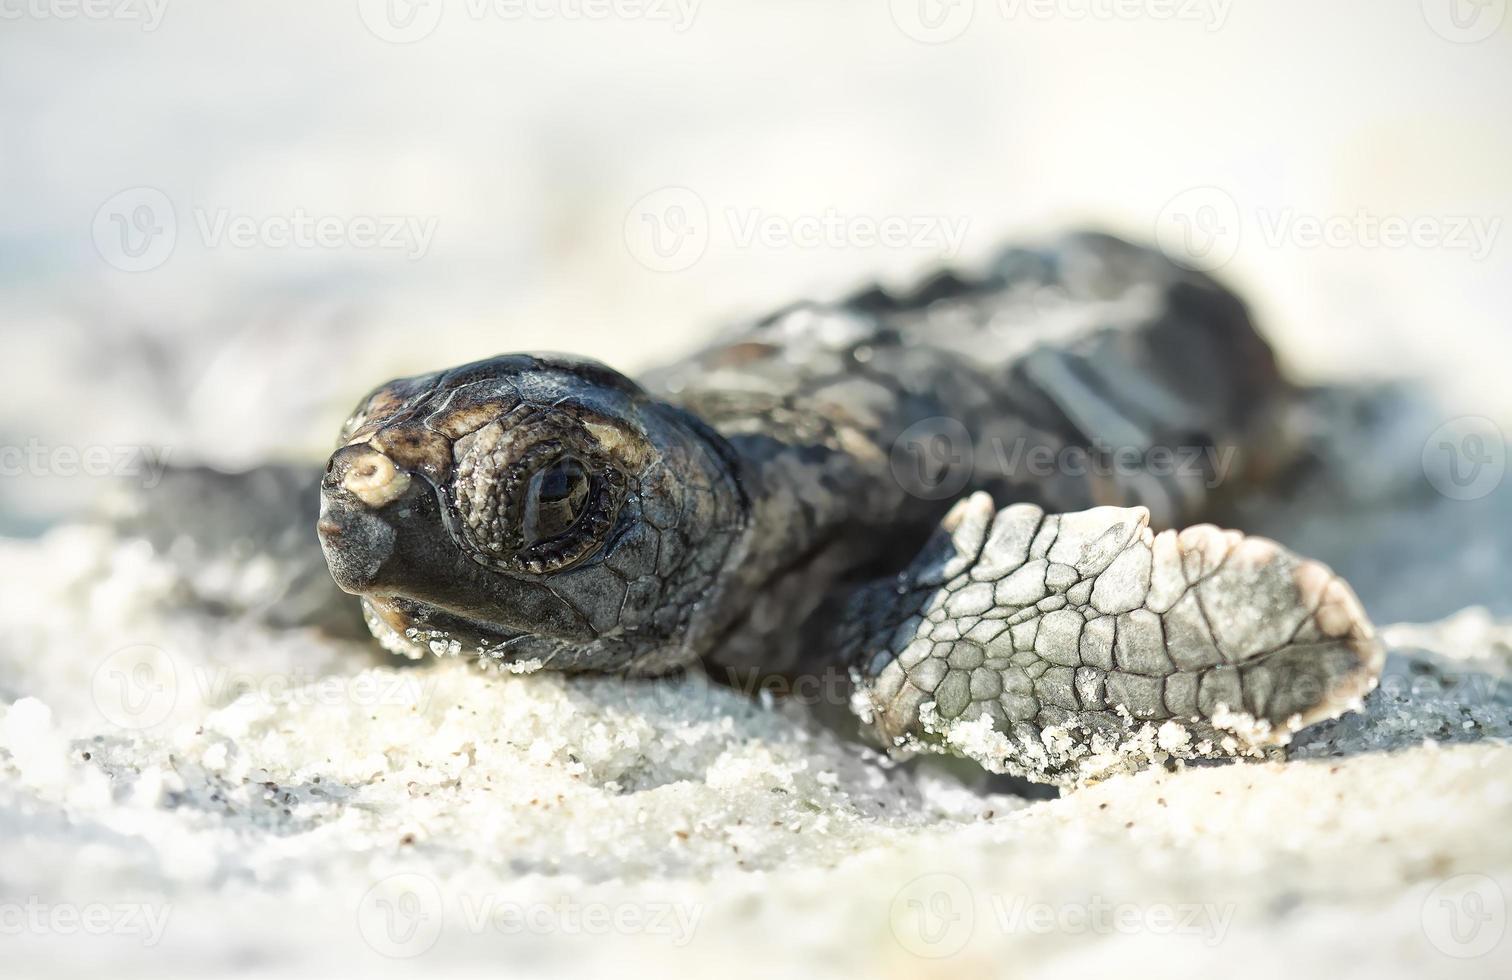 filhote de tartaruga cabeçuda foto